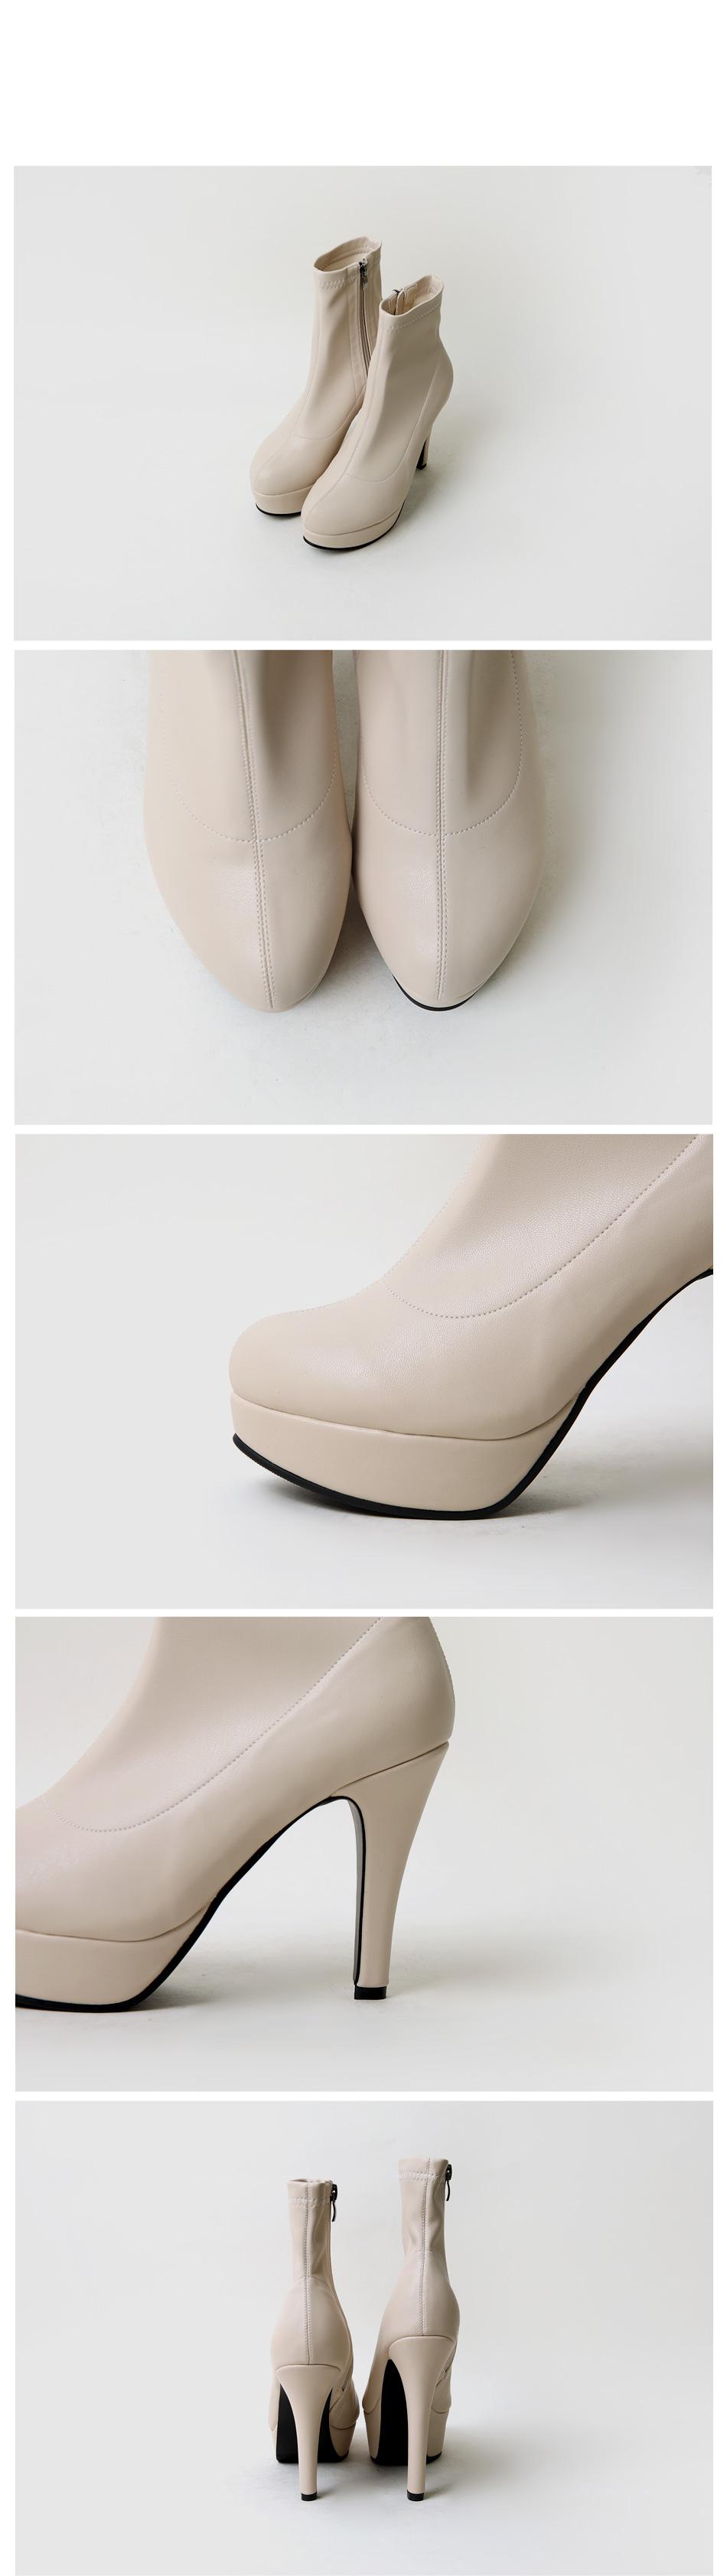 Kepis heirloom socks ankle boots 11,13cm